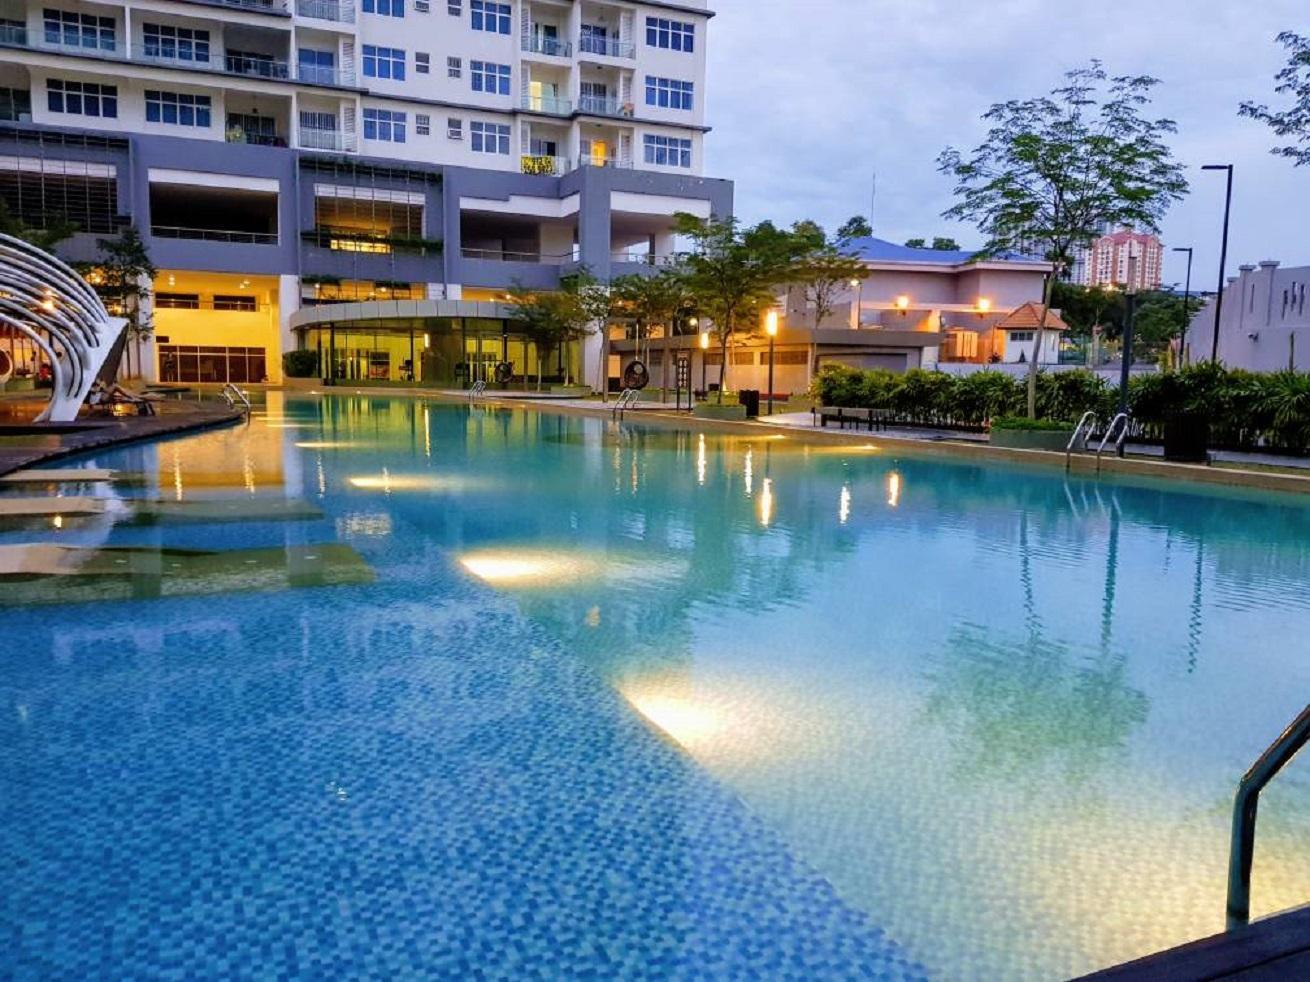 Puchong 10 Pax IOI Mall Cozy Apartment Skypod